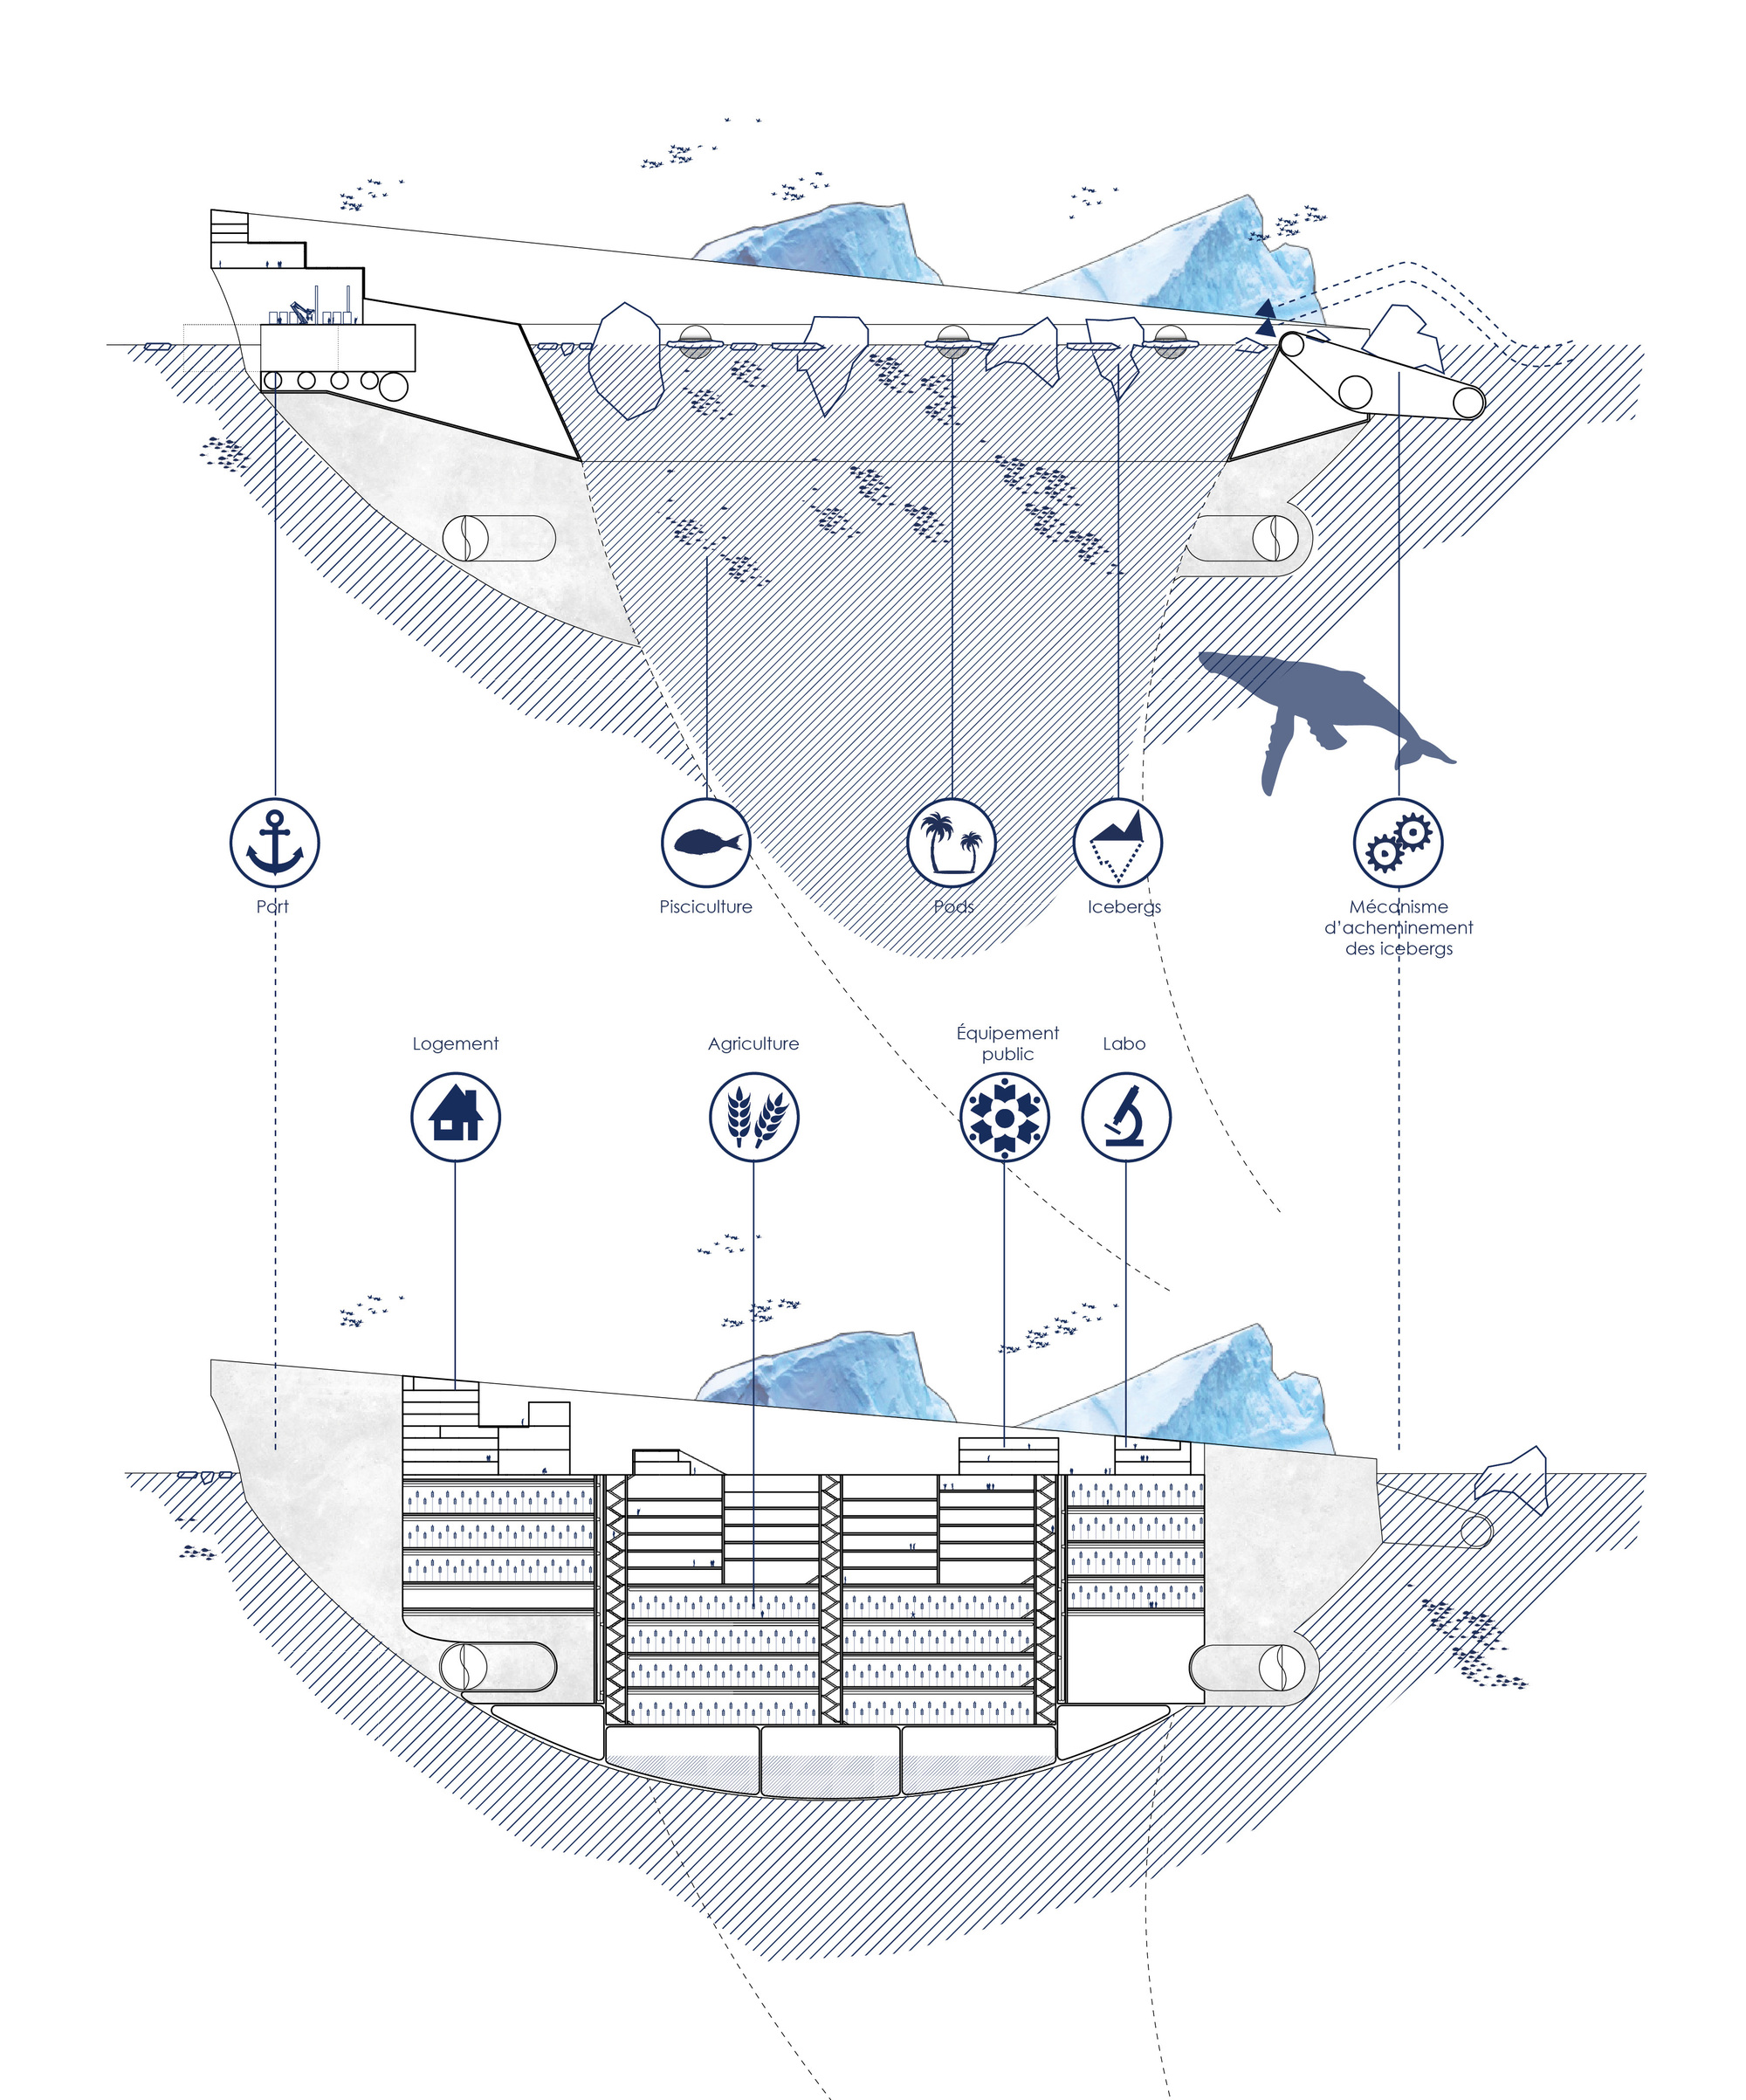 Galeria De Arctic Harvester Prop U00f5e Fazenda Hidrop U00f4nica Nos